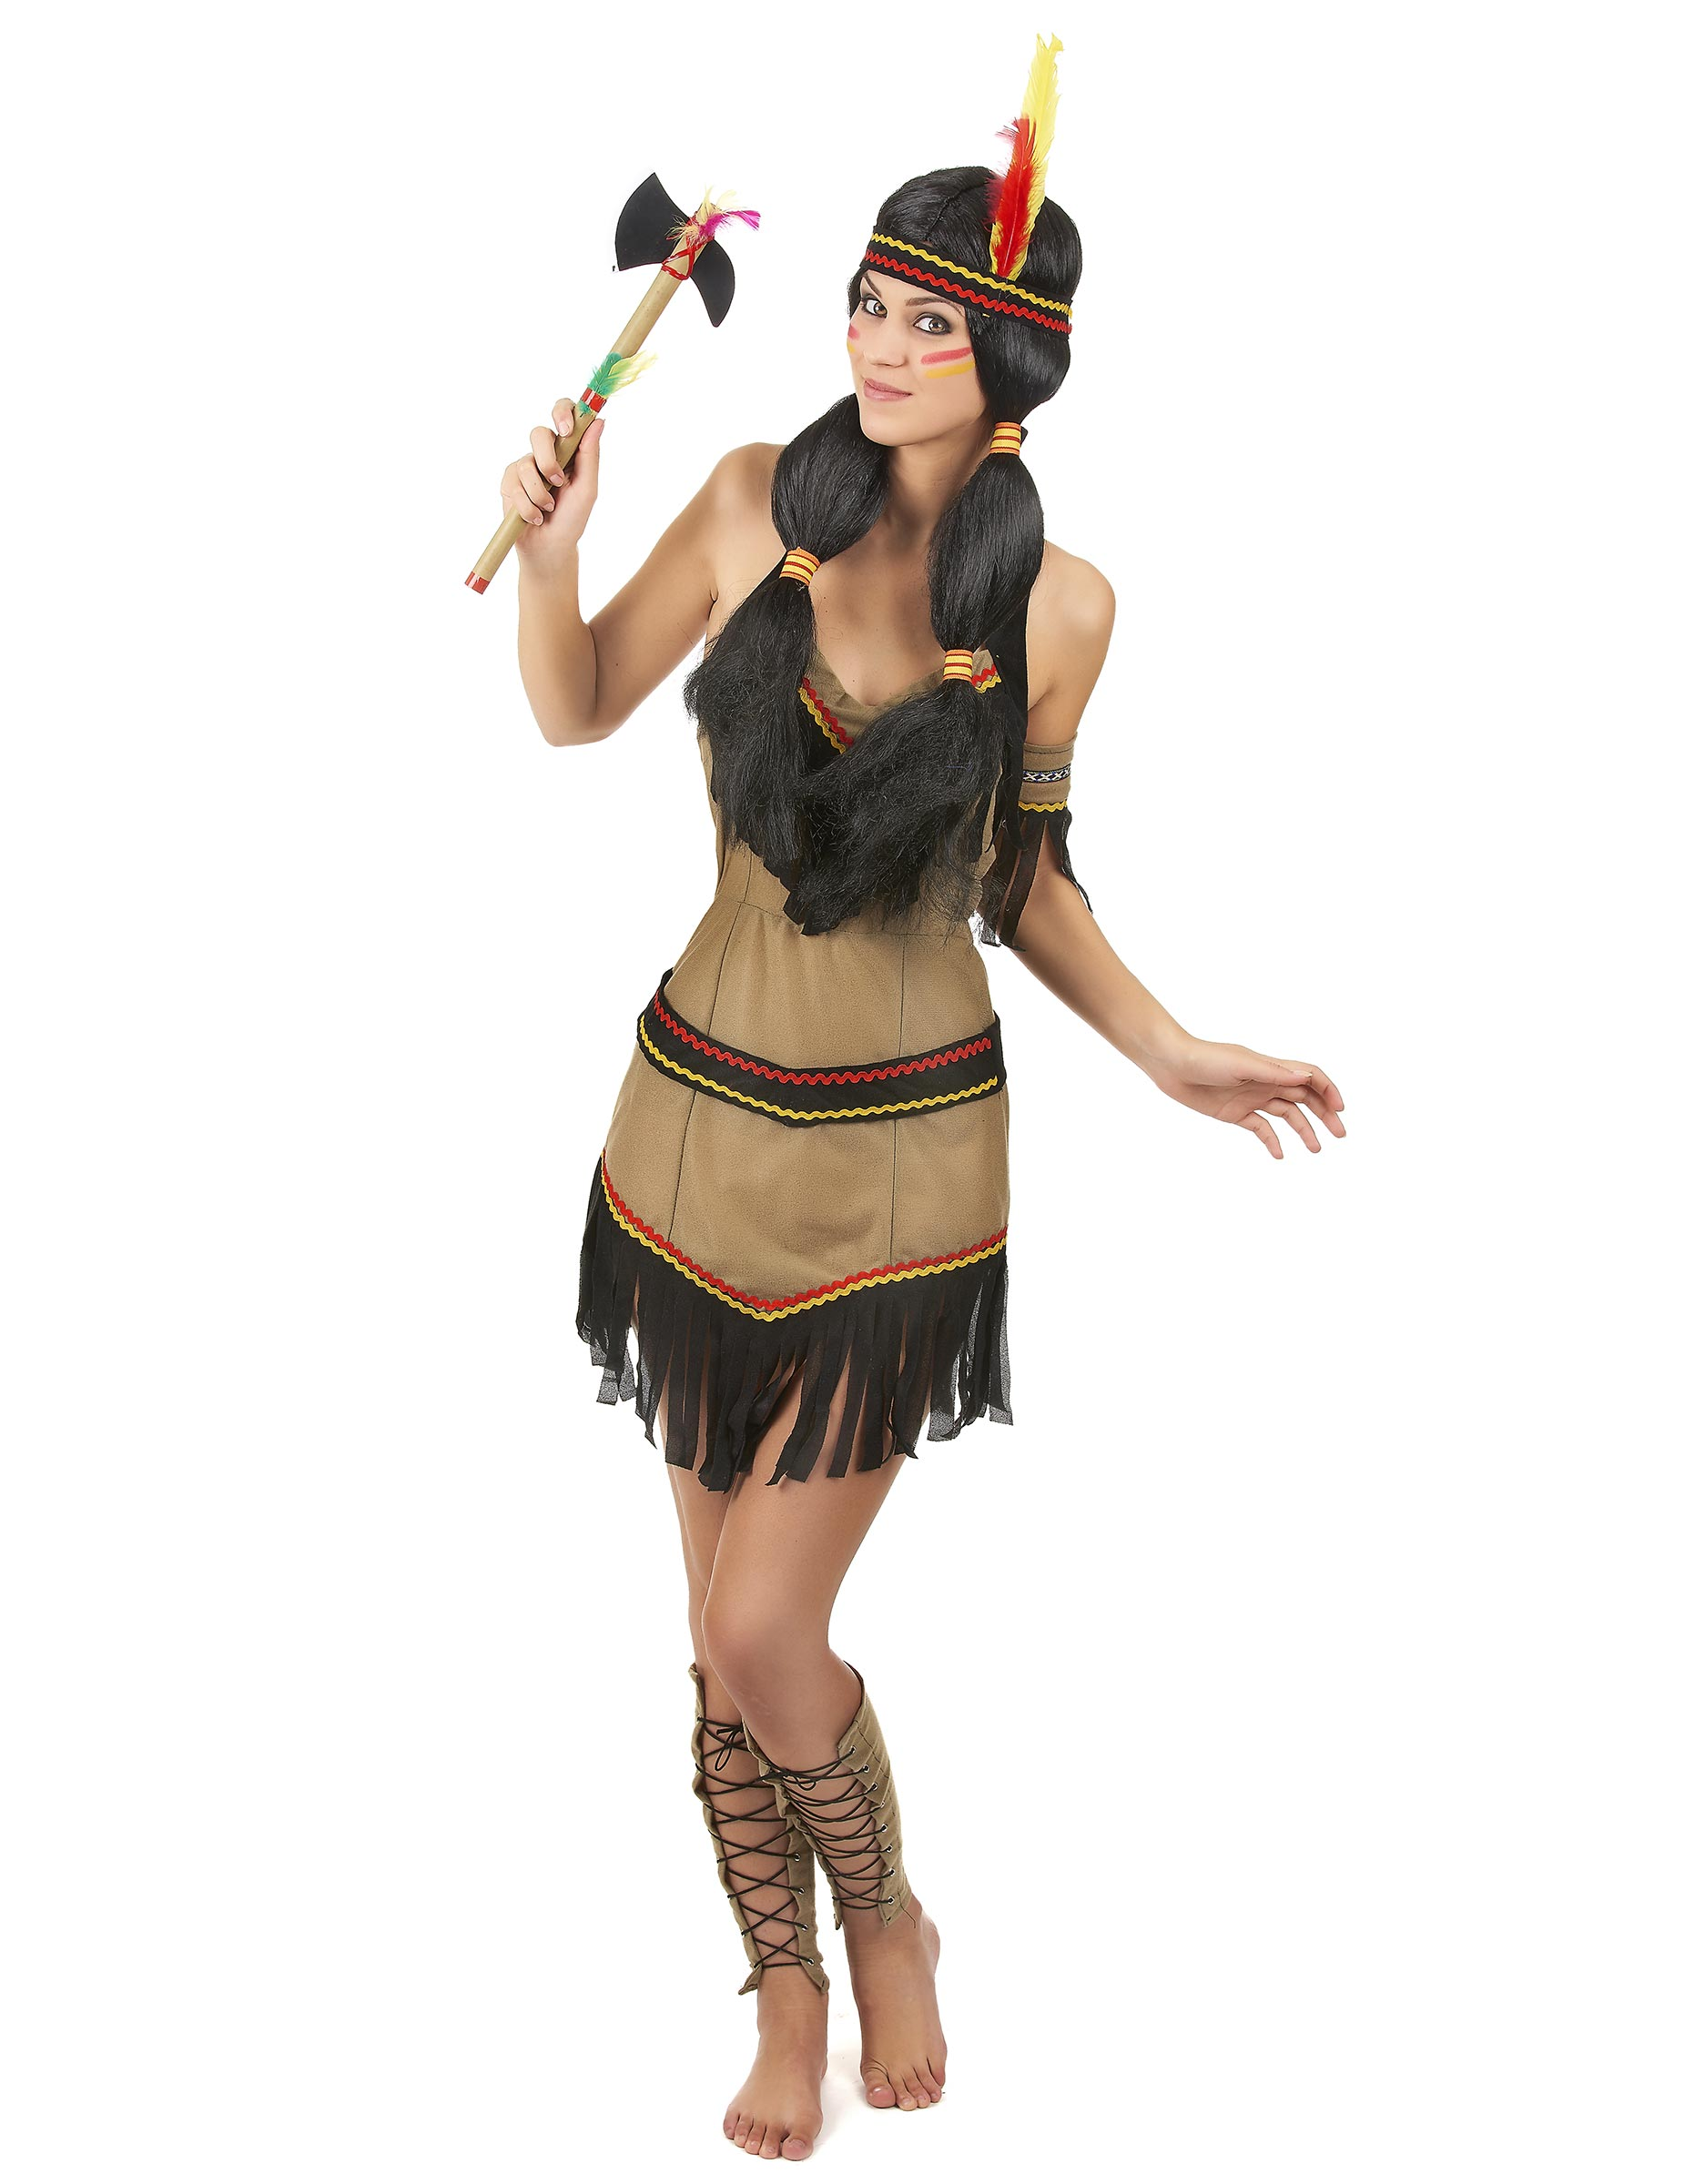 01b4b93ad0b6 Vestiti di Carnevale cowboy e indiani western   Vestiti indiani ...